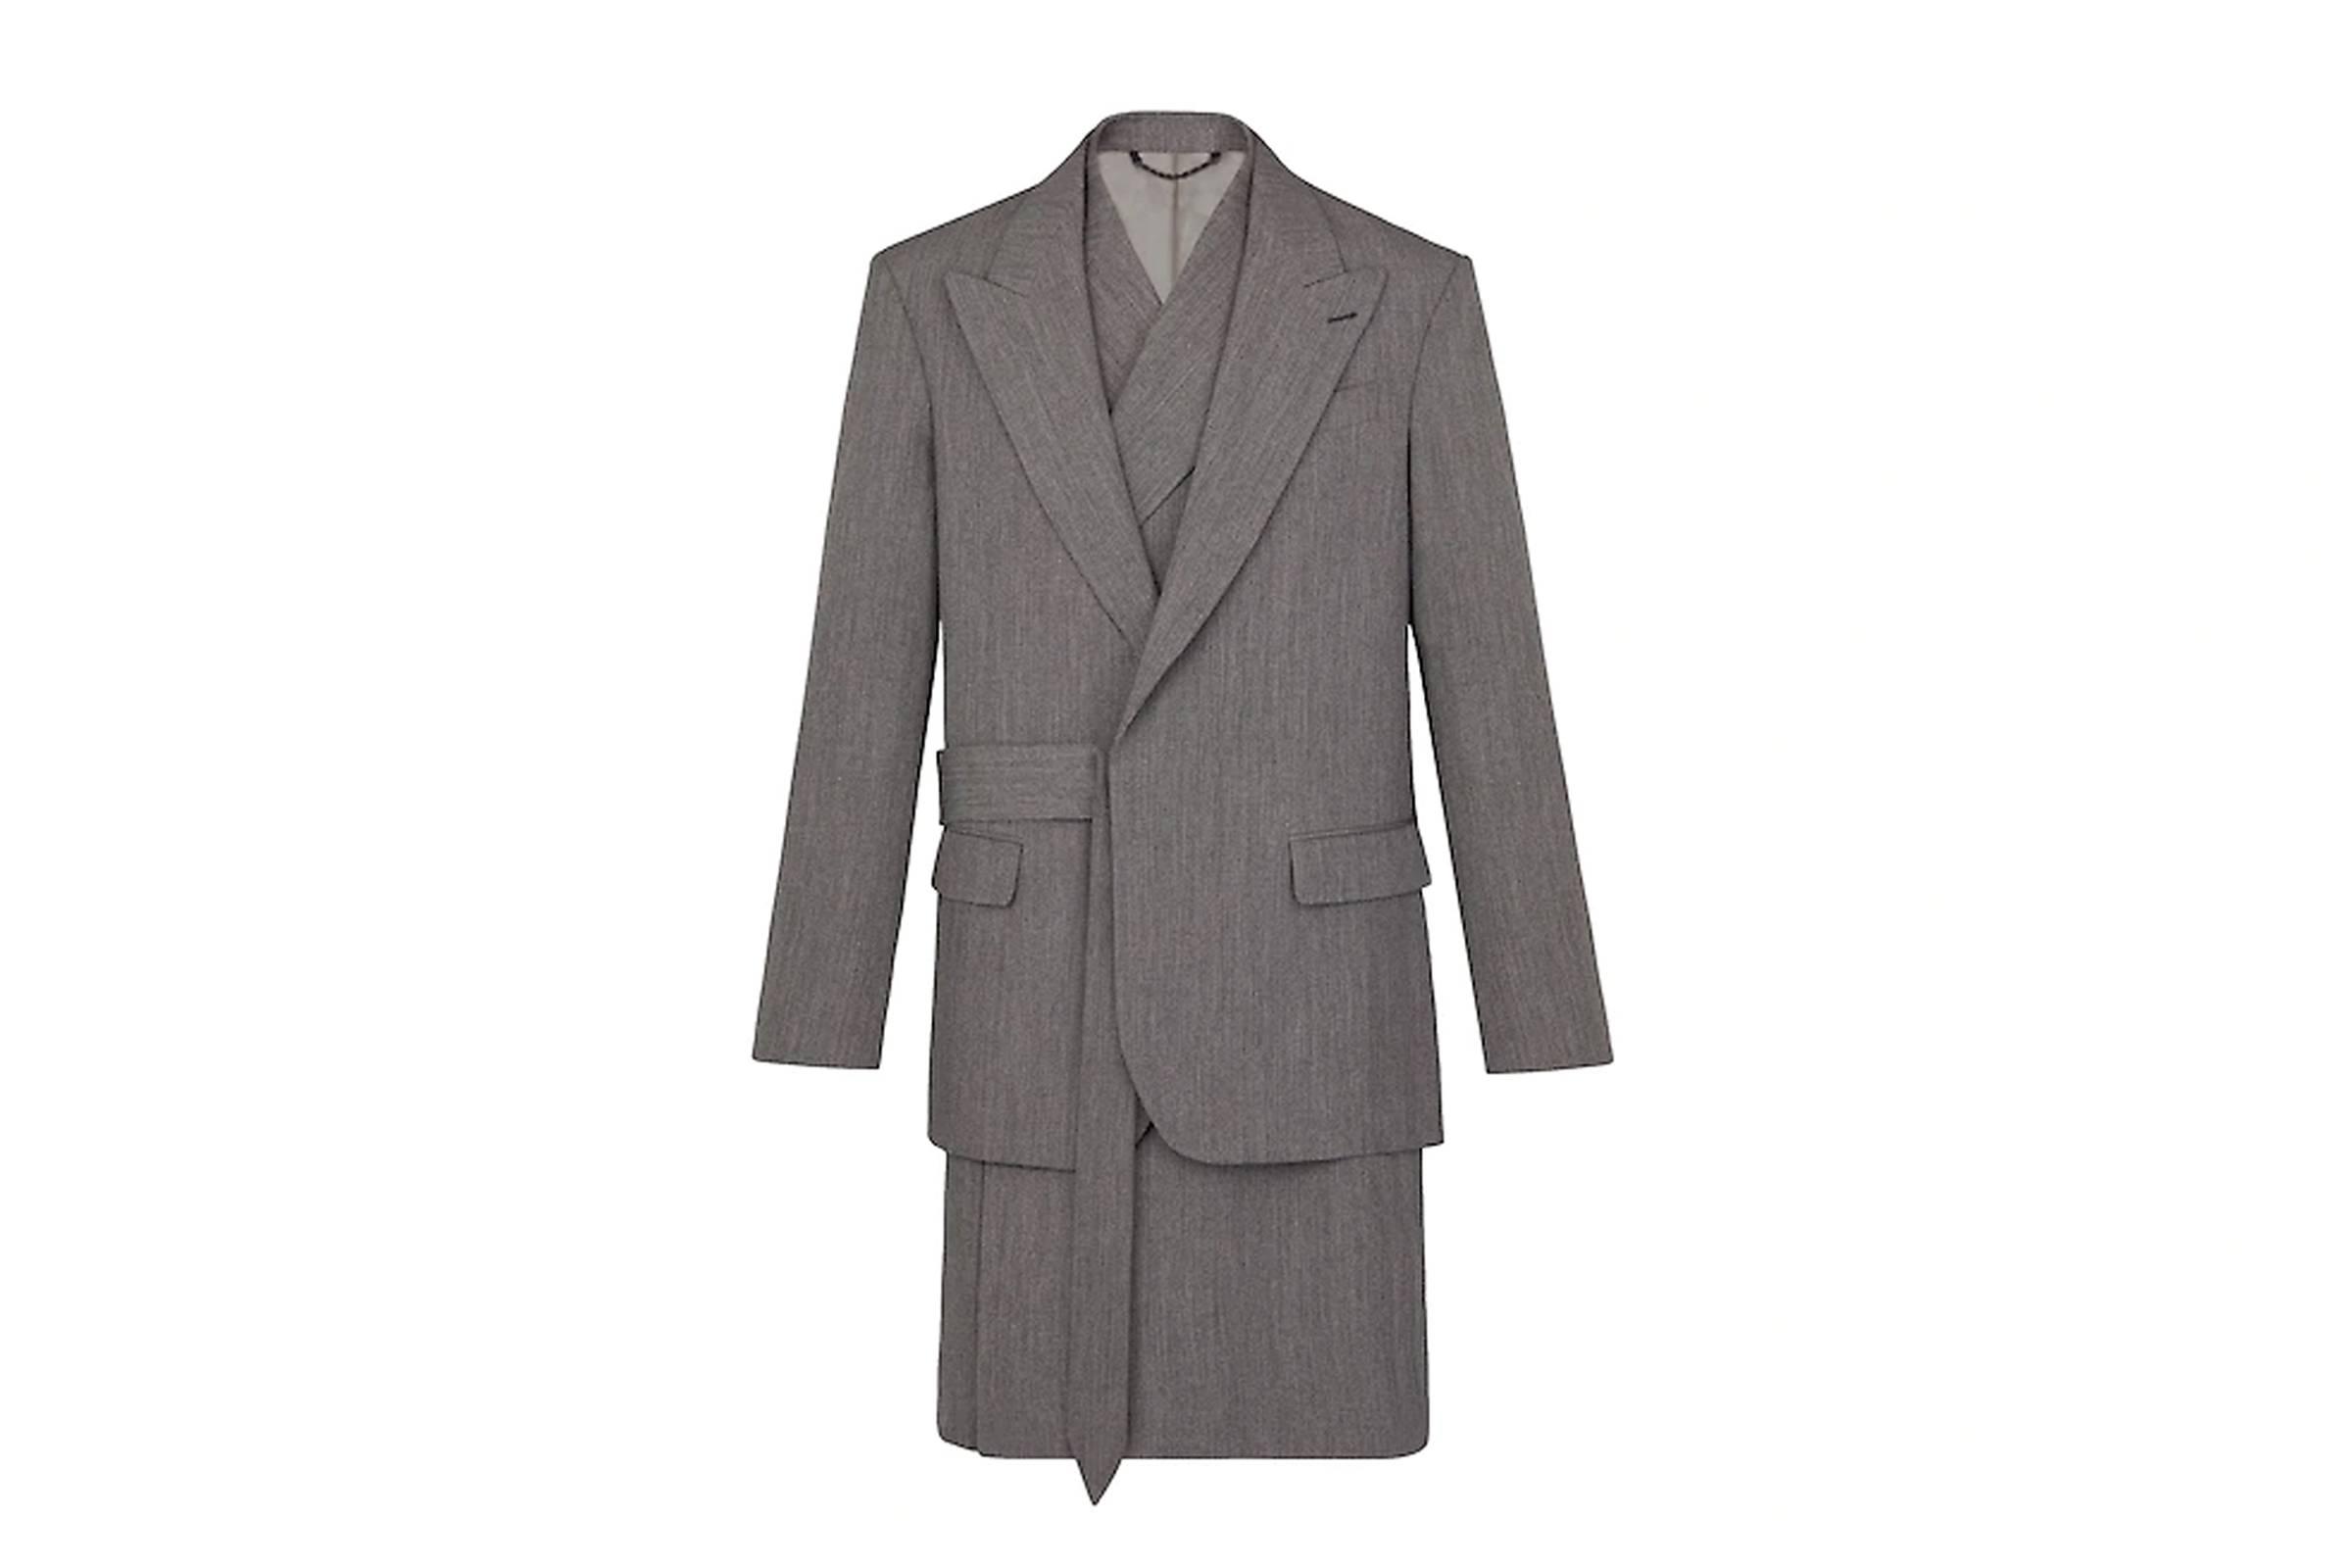 Louis Vuitton 3-in-1 Double Layer Coat